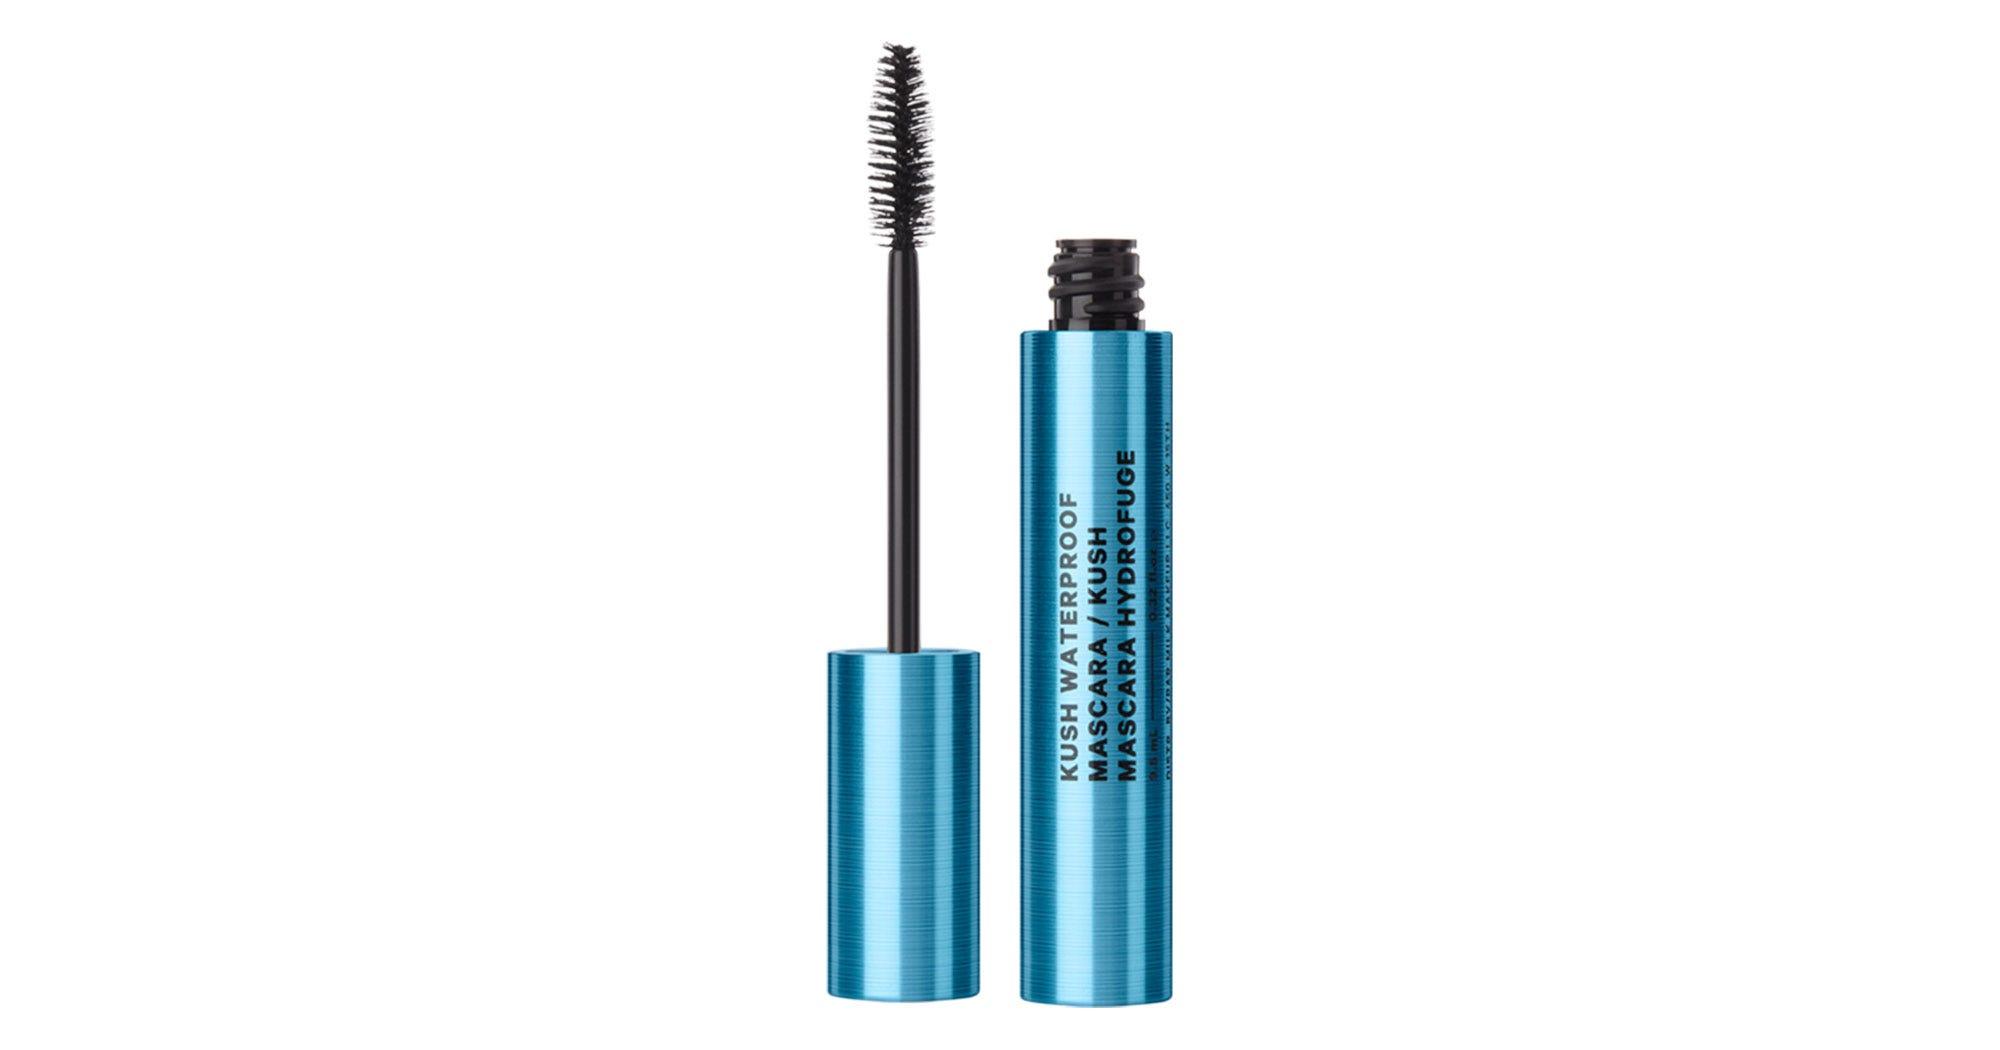 d1c9a18b8fe Best Waterproof Mascara 2019 Long-Lasting & Smudge Free